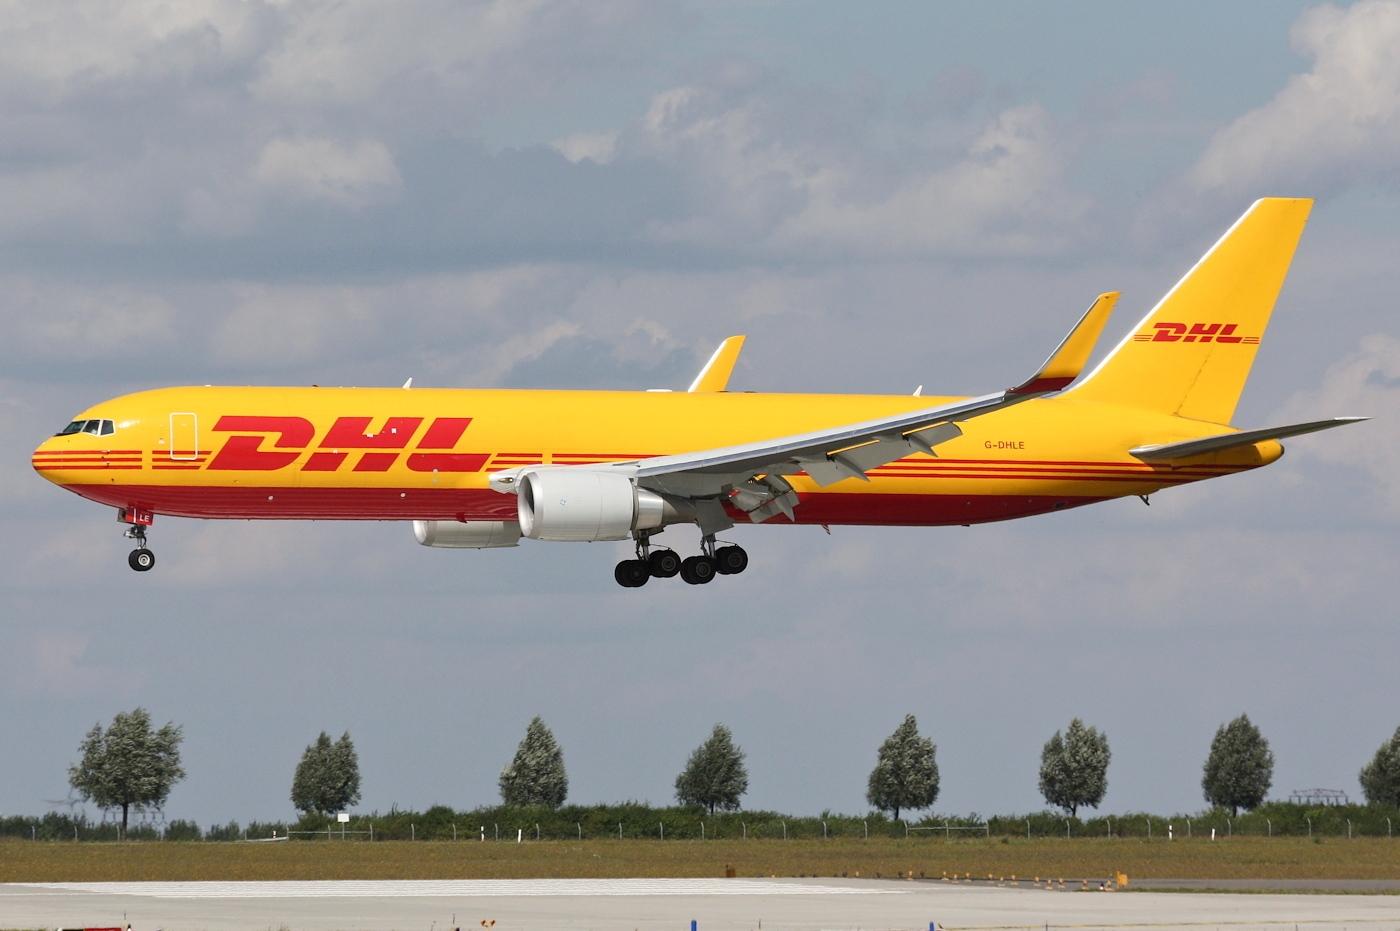 http://3.bp.blogspot.com/-MPMAKds9fQQ/UAgZ-h4qg4I/AAAAAAAAKsY/NHcoIqsnd4M/s1600/boeing_767-300_dhl_cargo_air_service.jpg